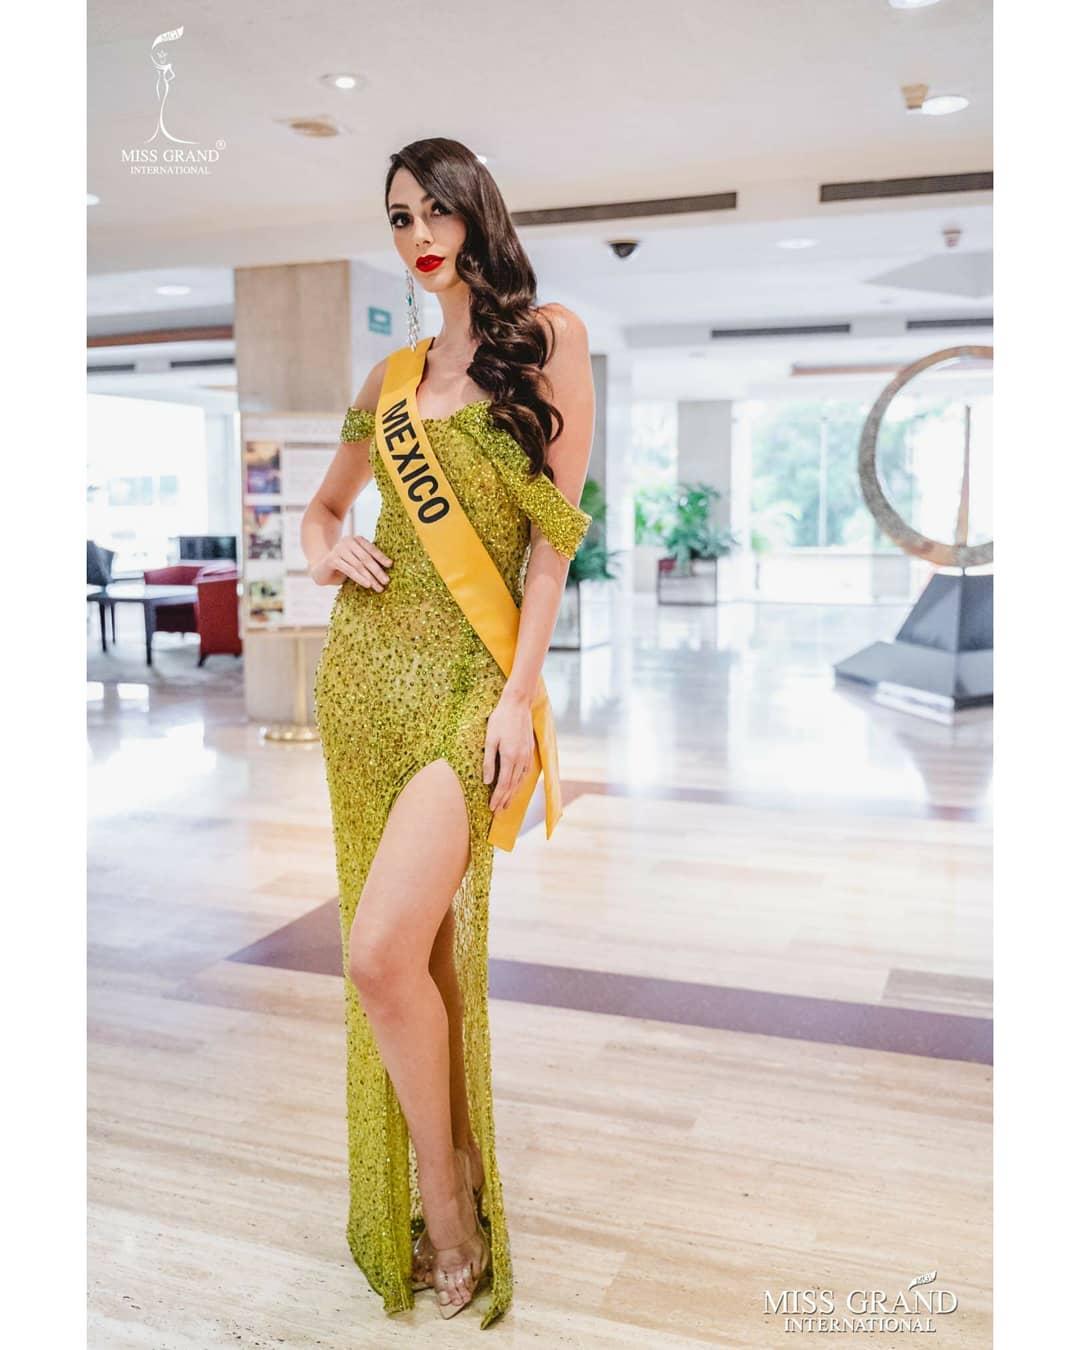 maria malo, 1st runner-up de miss grand international 2019. - Página 15 74601610